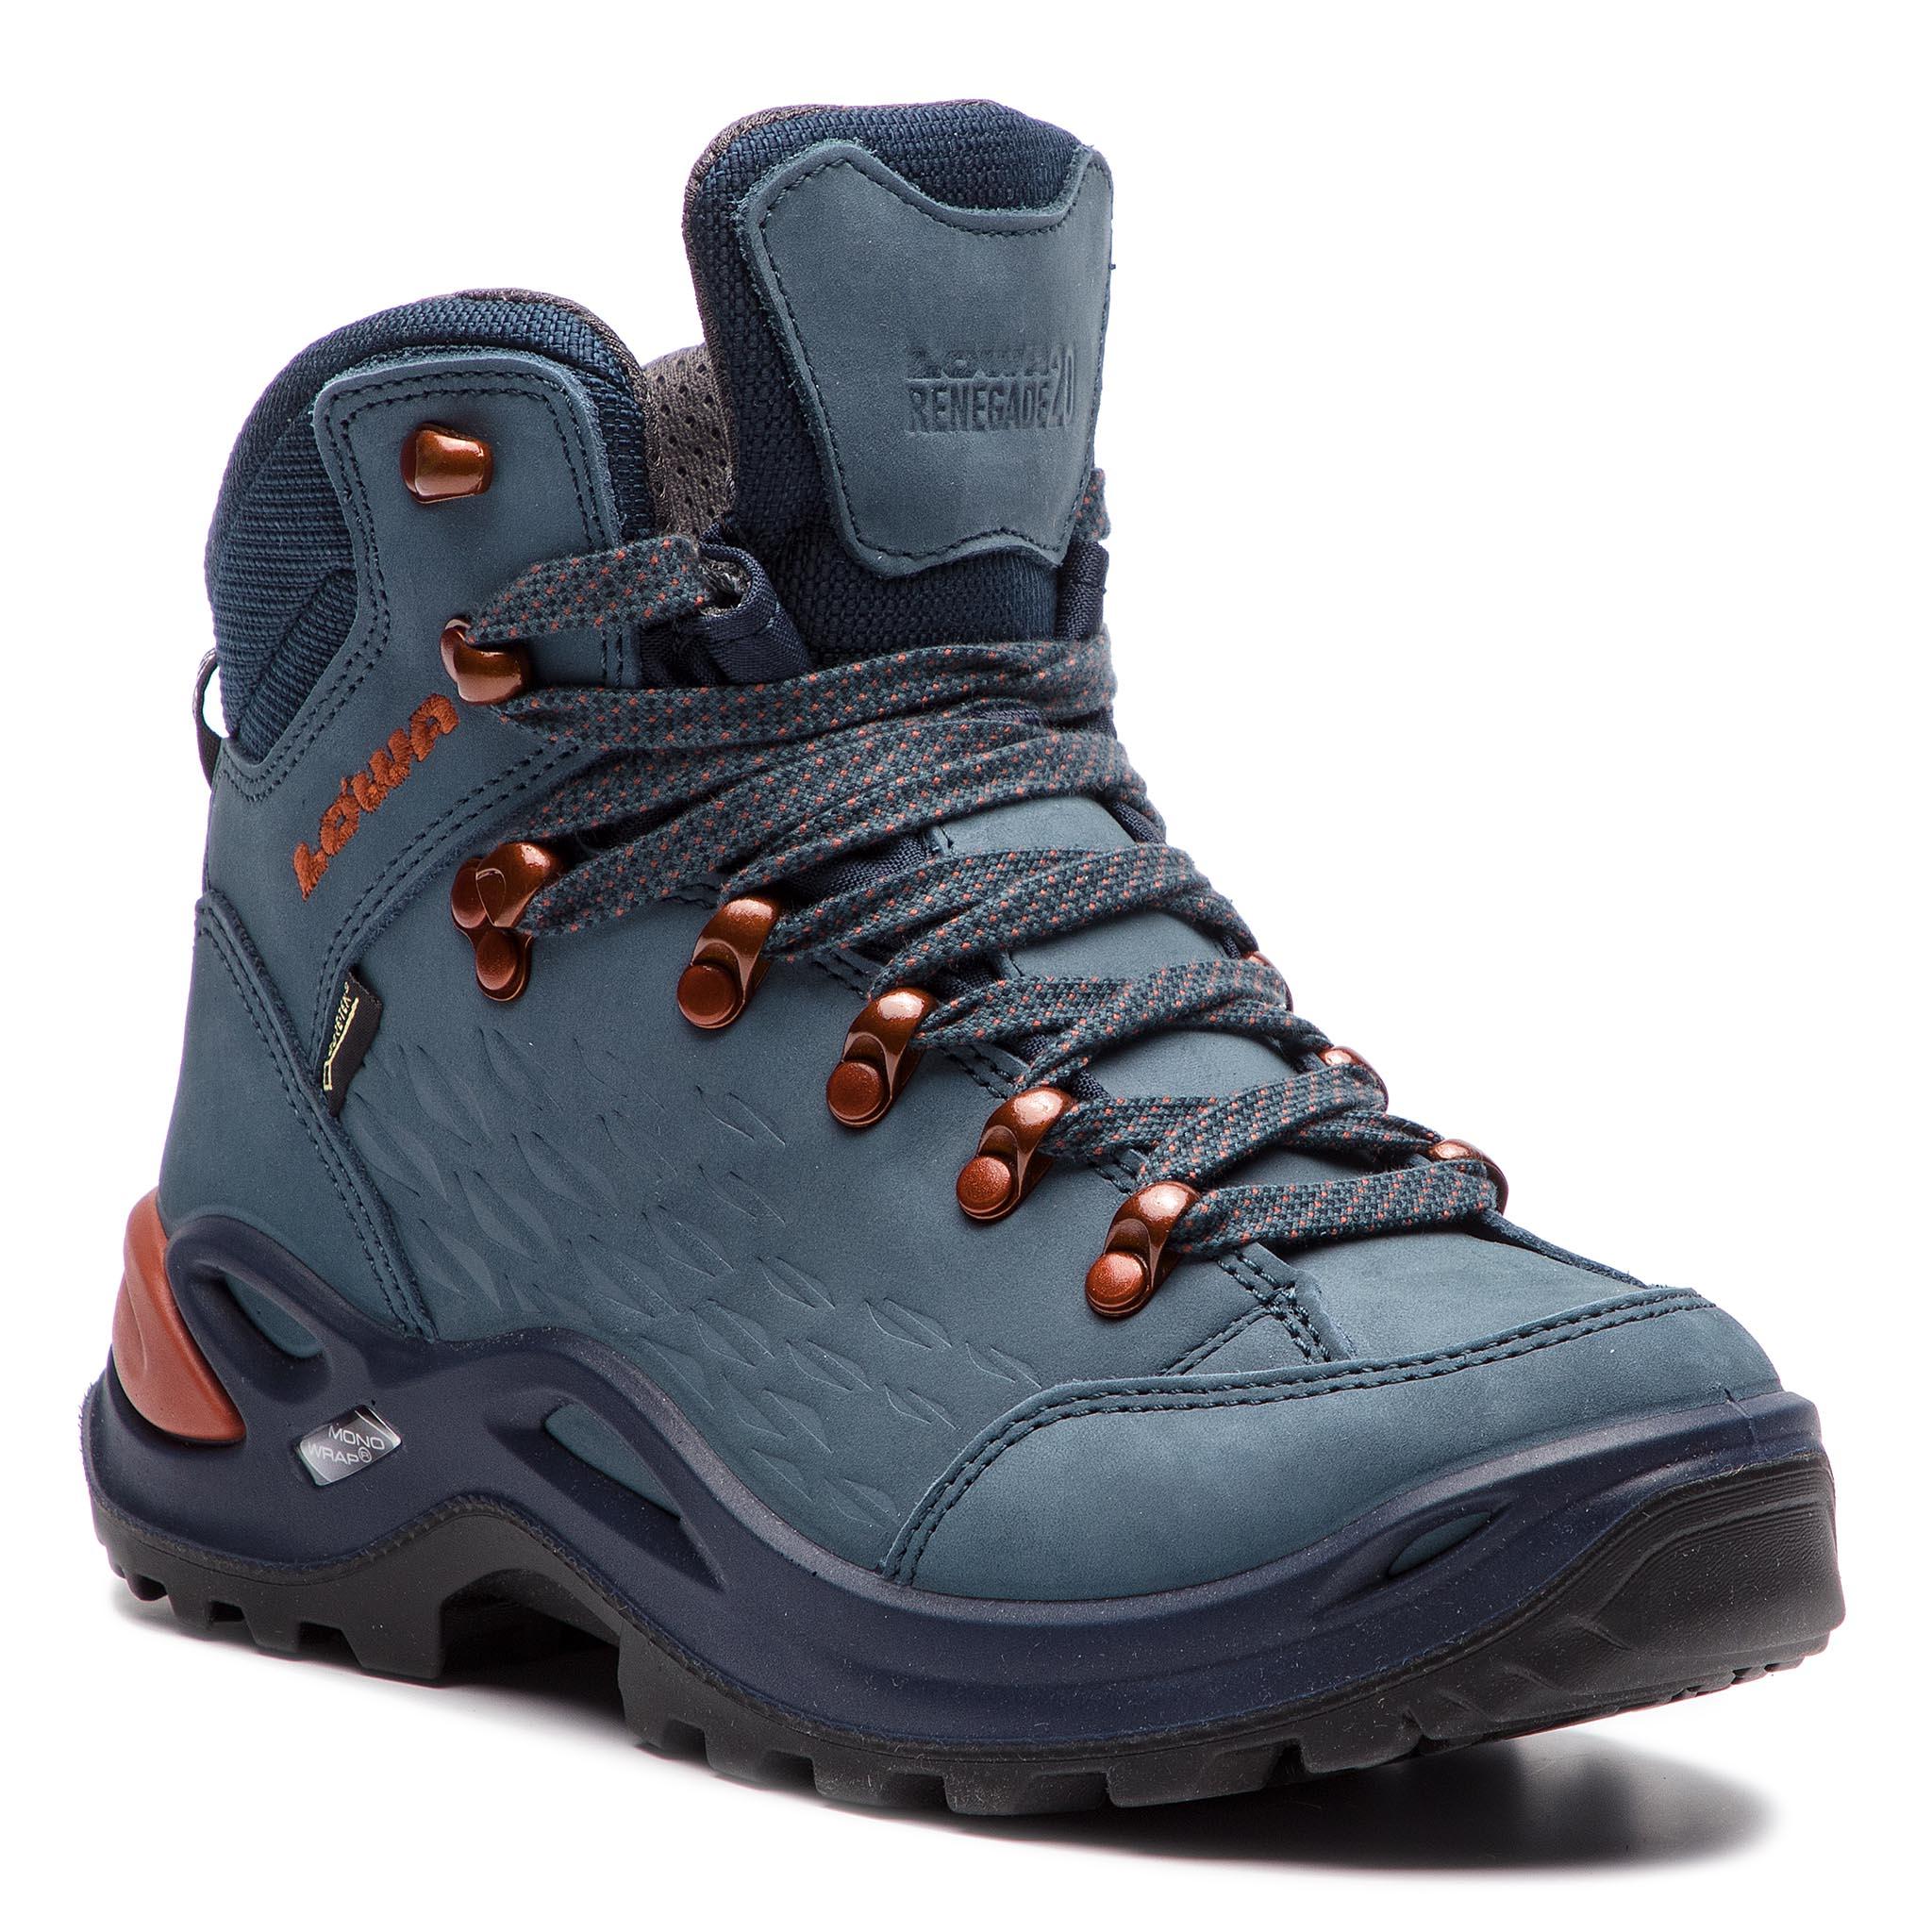 Trekingová obuv LOWA - Renegade Gtx Mid Ws GORE-TEX 320920 Iceblue ... 6d932bbcbb5